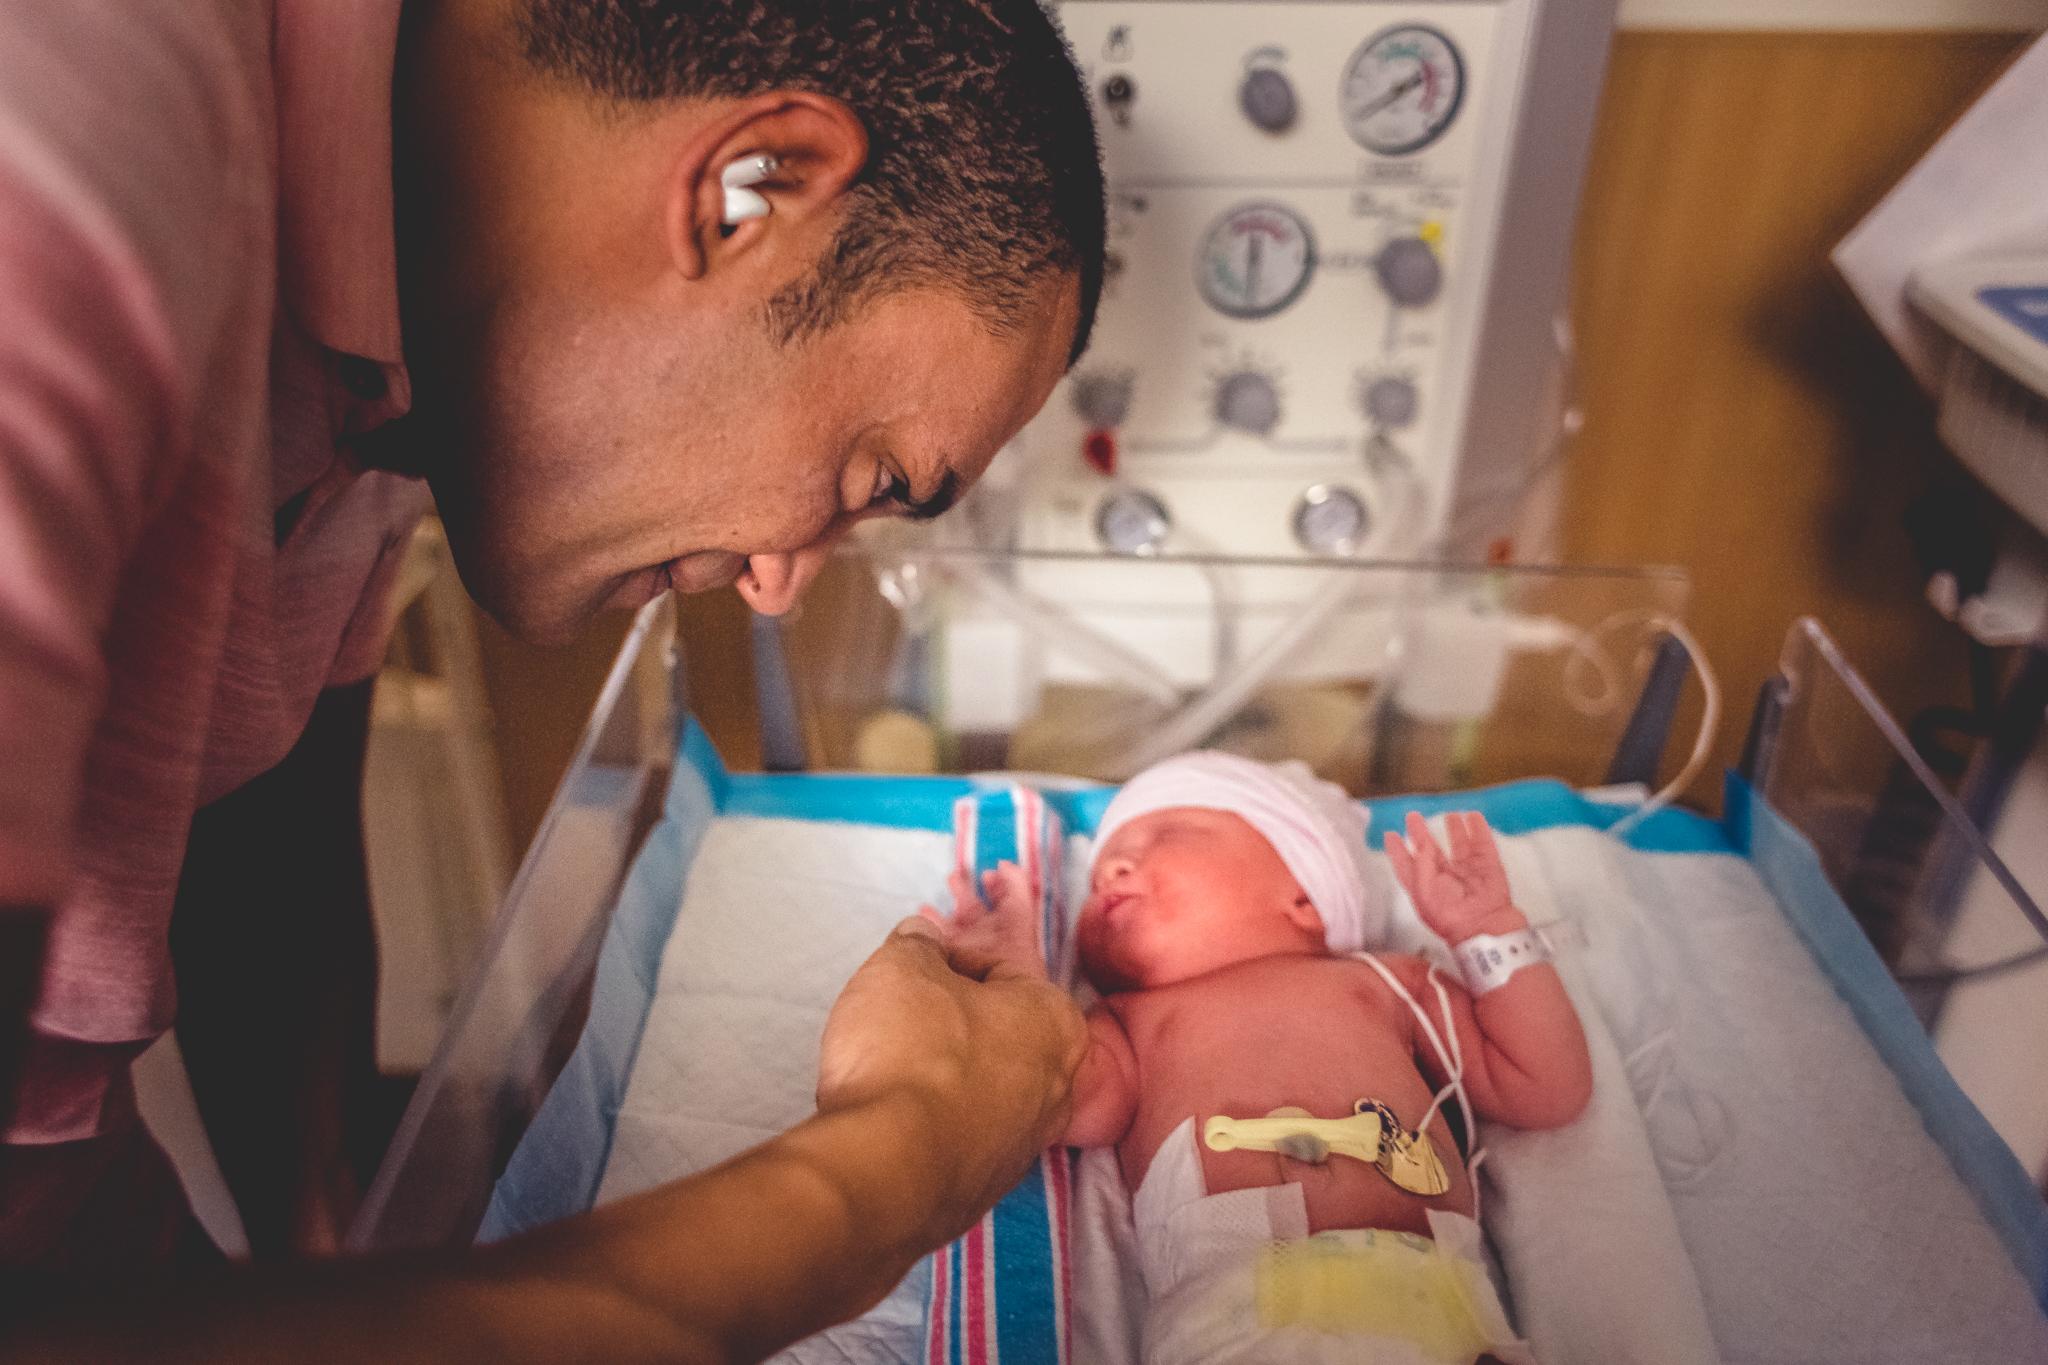 gentle cesarean birth photography and birth videography birth videographer boca raton florida-12.jpg